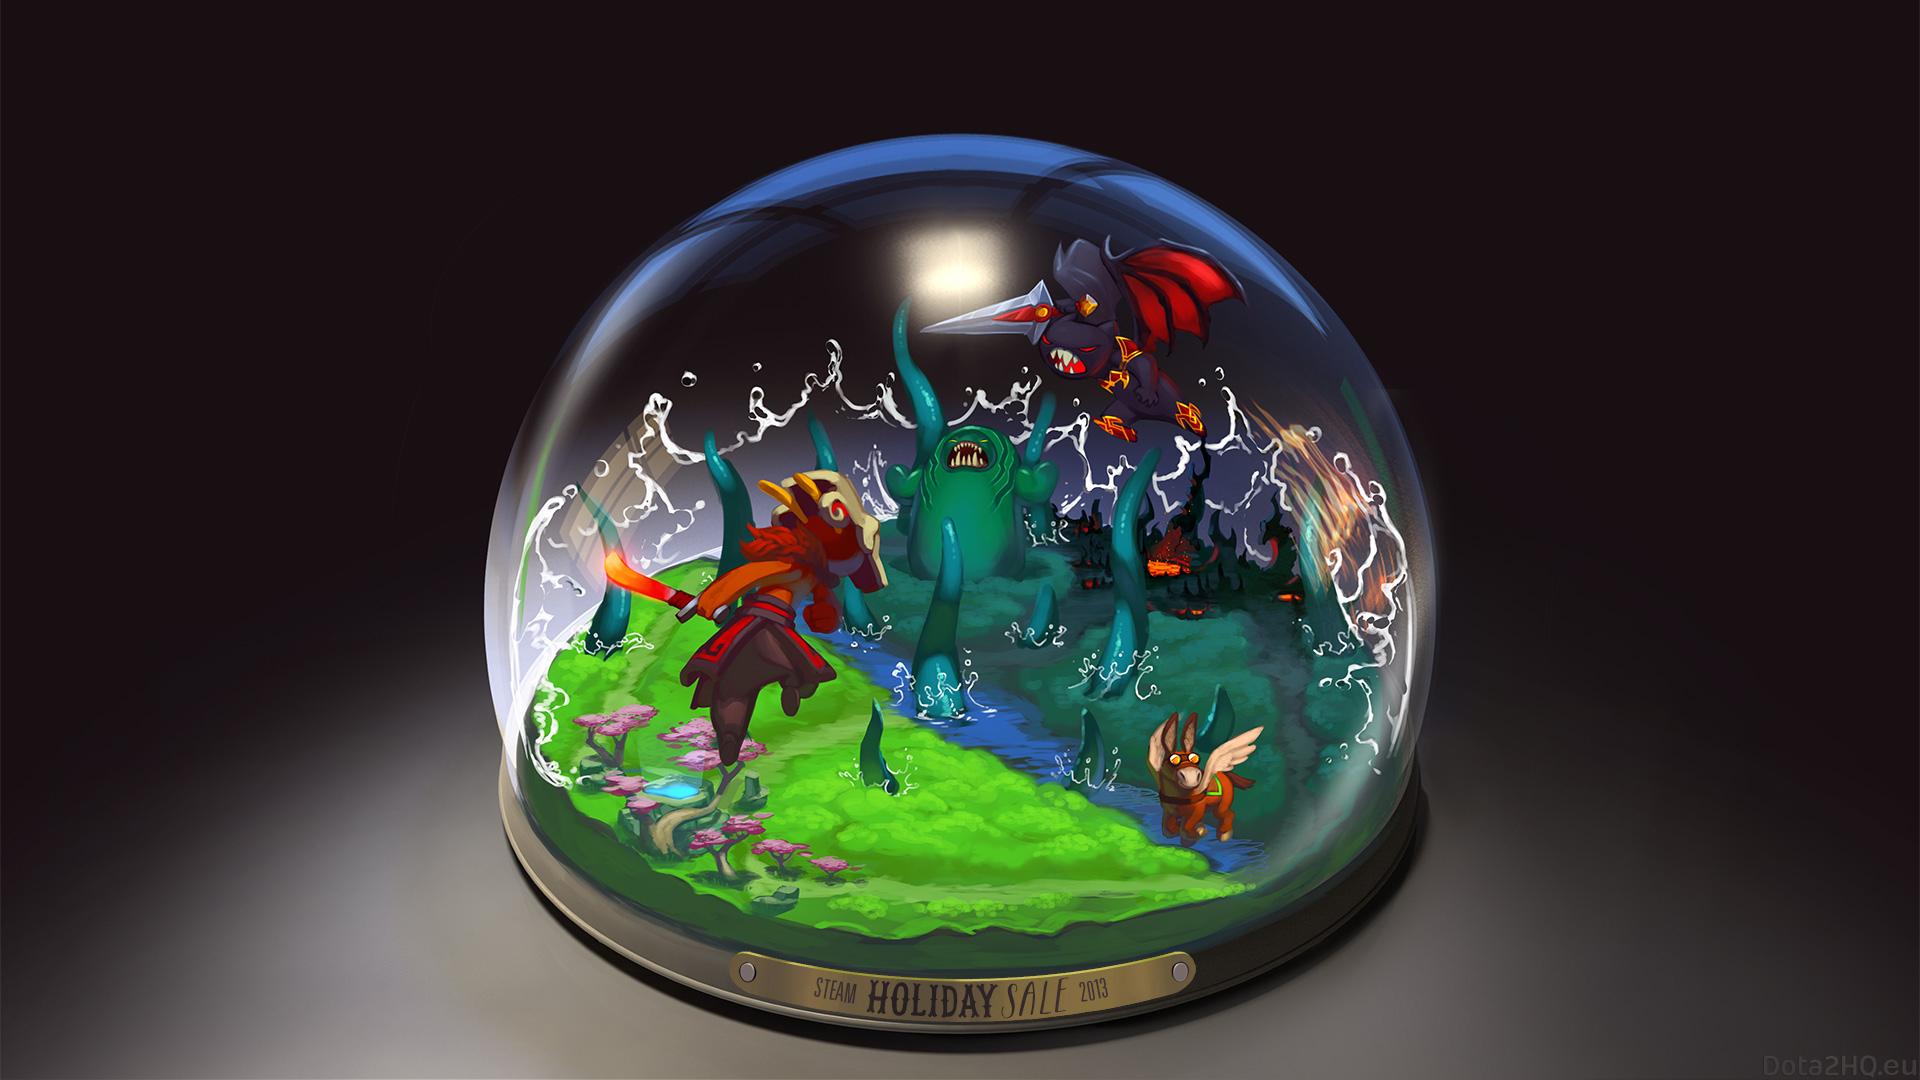 wallpaper illustration sphere earth glass dota 2 toy snow